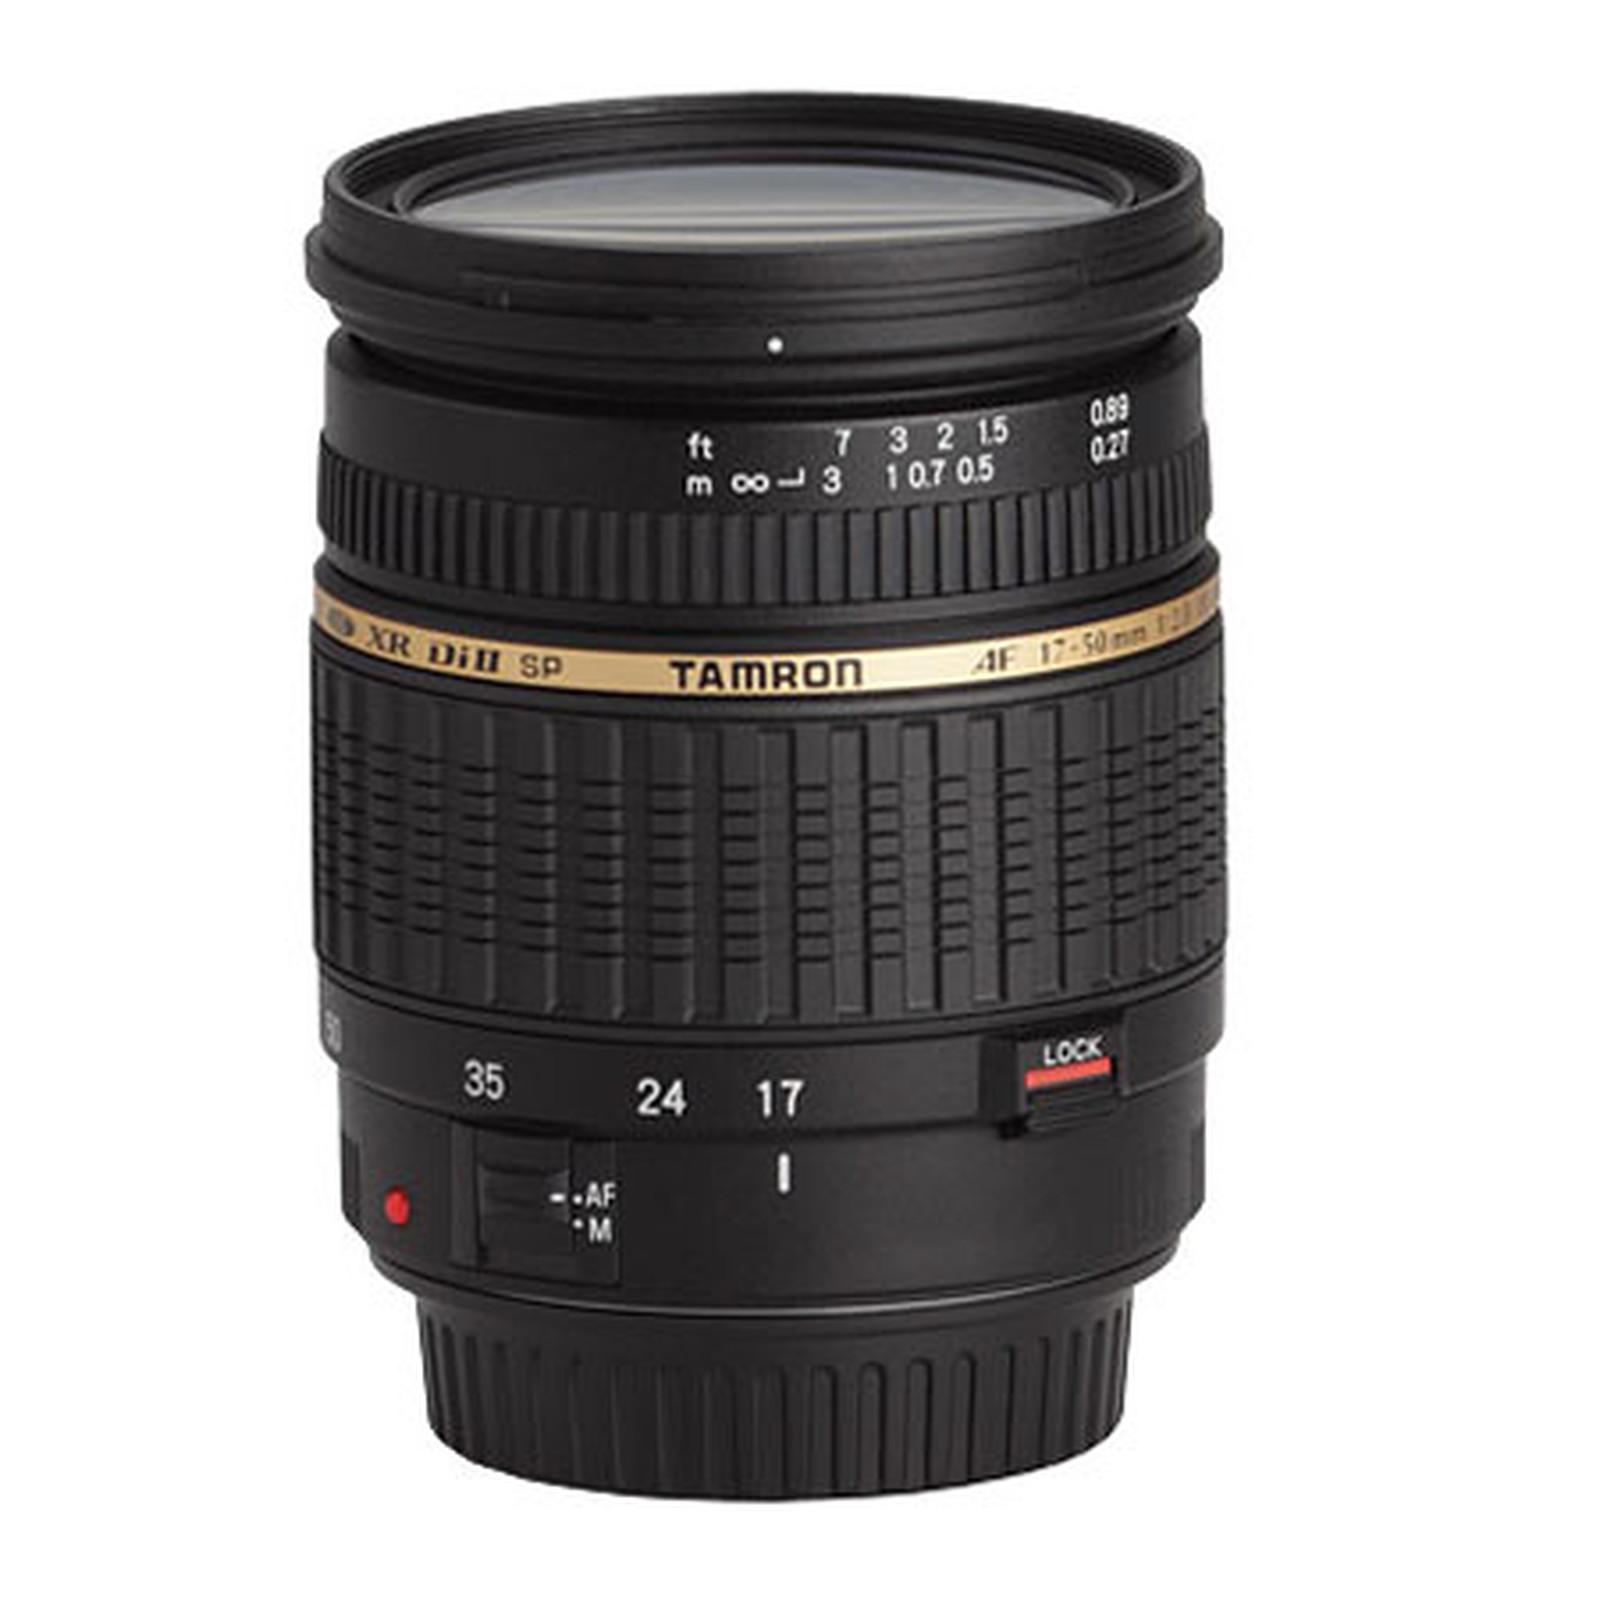 Tamron SP AF 17-50mm F/2,8 XR Di II LD ASL [IF] monture Nikon